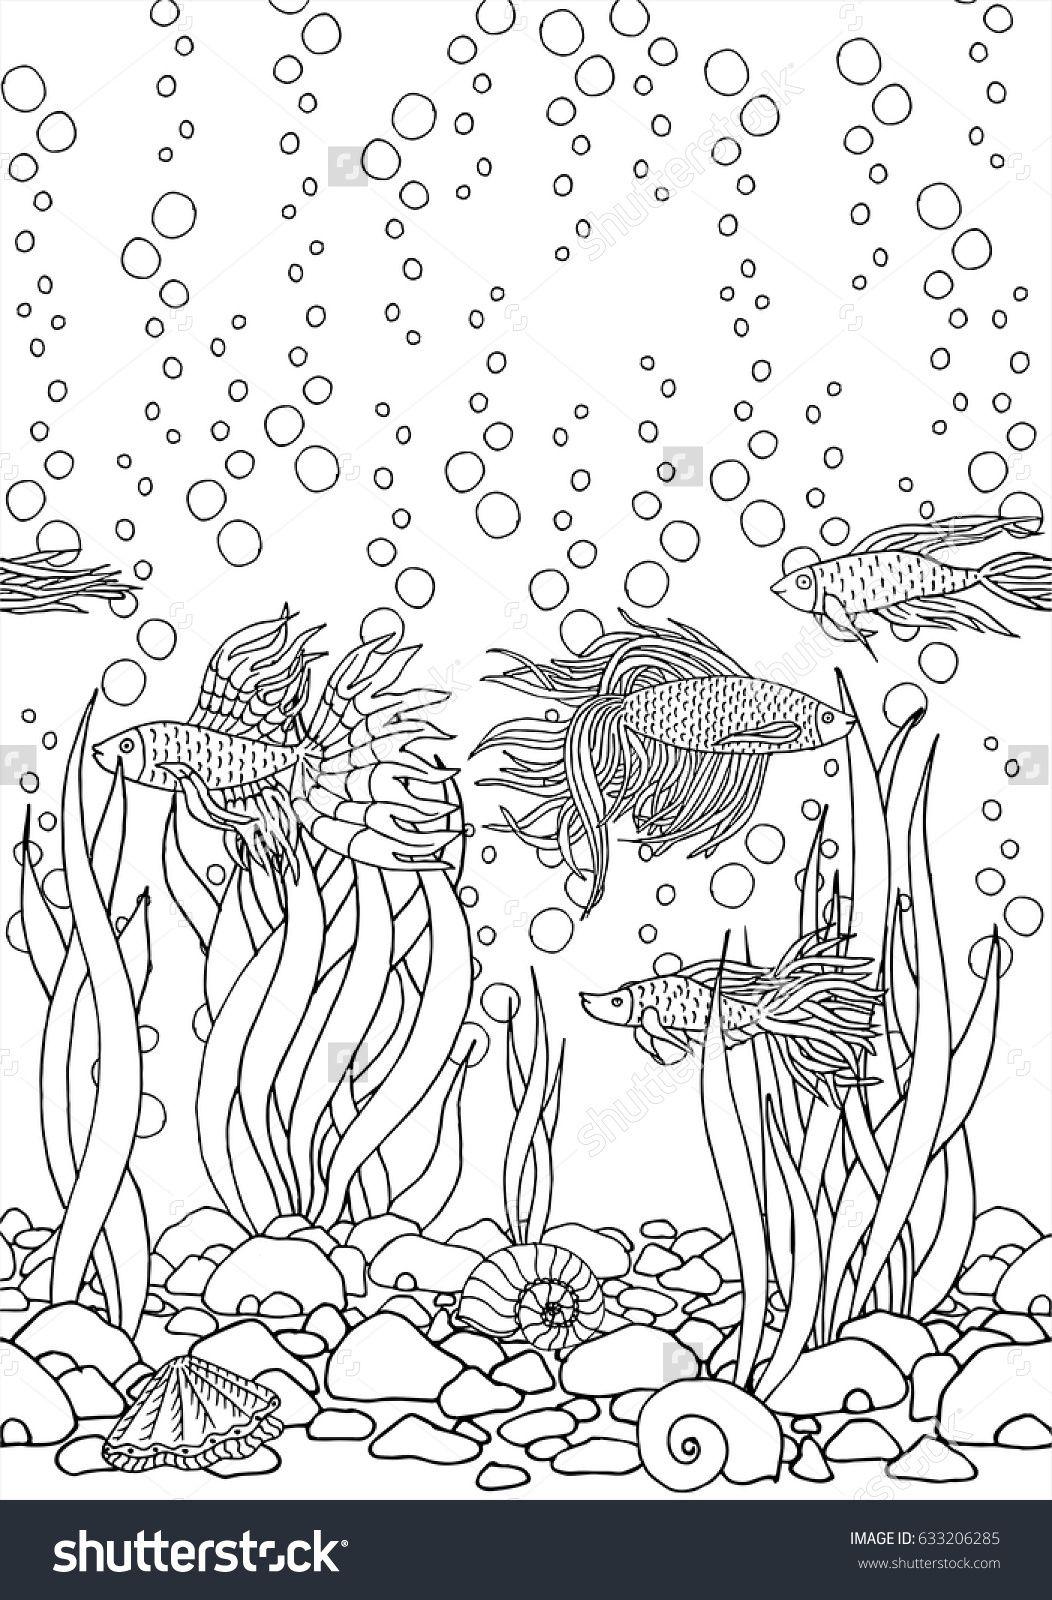 Hand Drawn Vector Fish Seaweed Seashells Stones Beautiful Aquarium Betta River Sea Black And White Drawing By Line Art